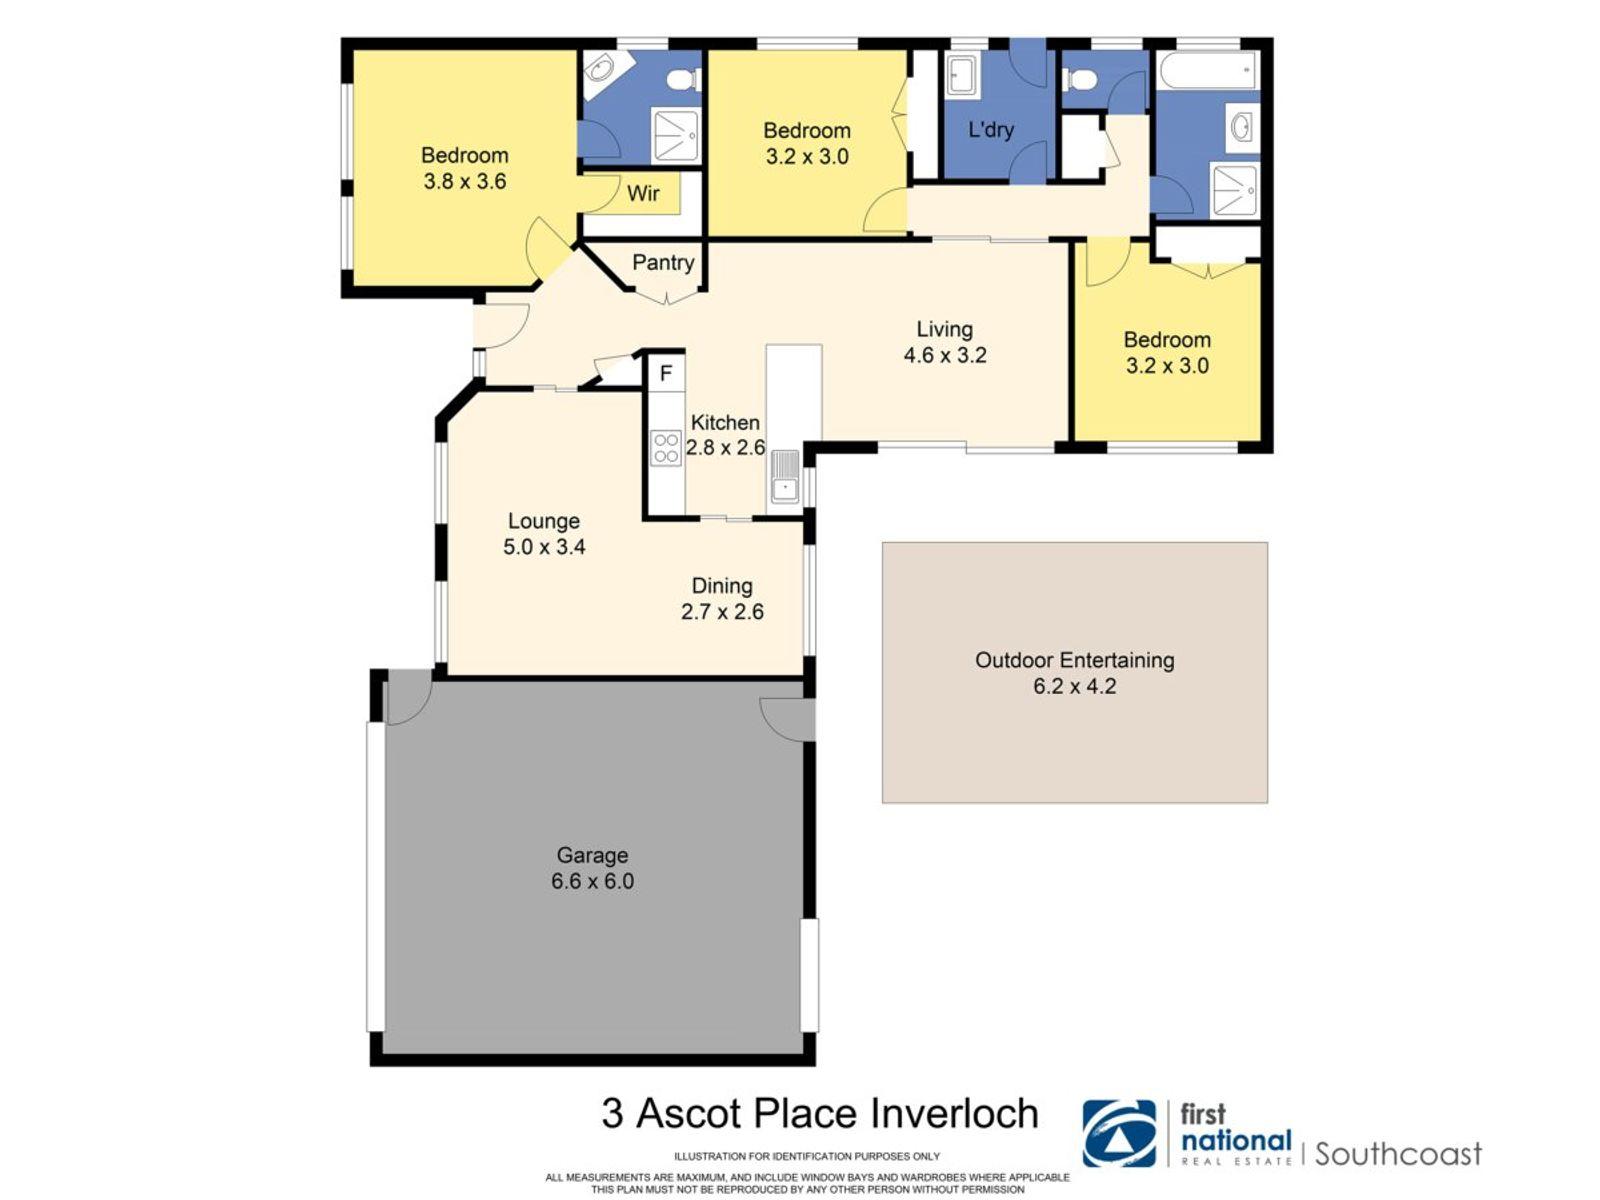 3 Ascot Place, Inverloch, VIC 3996